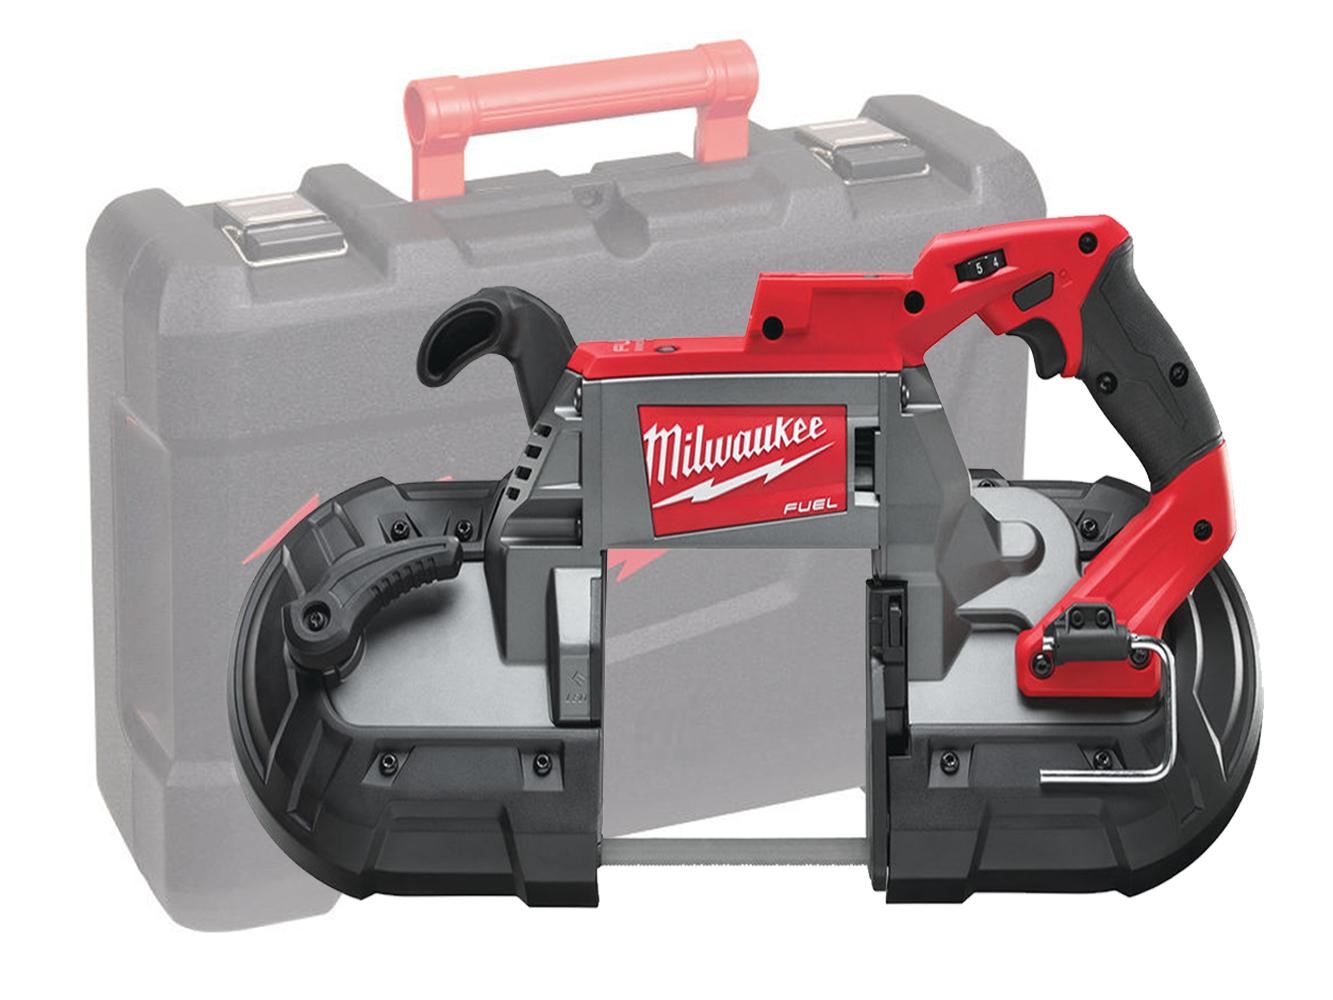 Milwaukee M18CBS125 18V FUEL Deep Cut Bandsaw 125mm x 125mm Cutting Capacity - Body Only